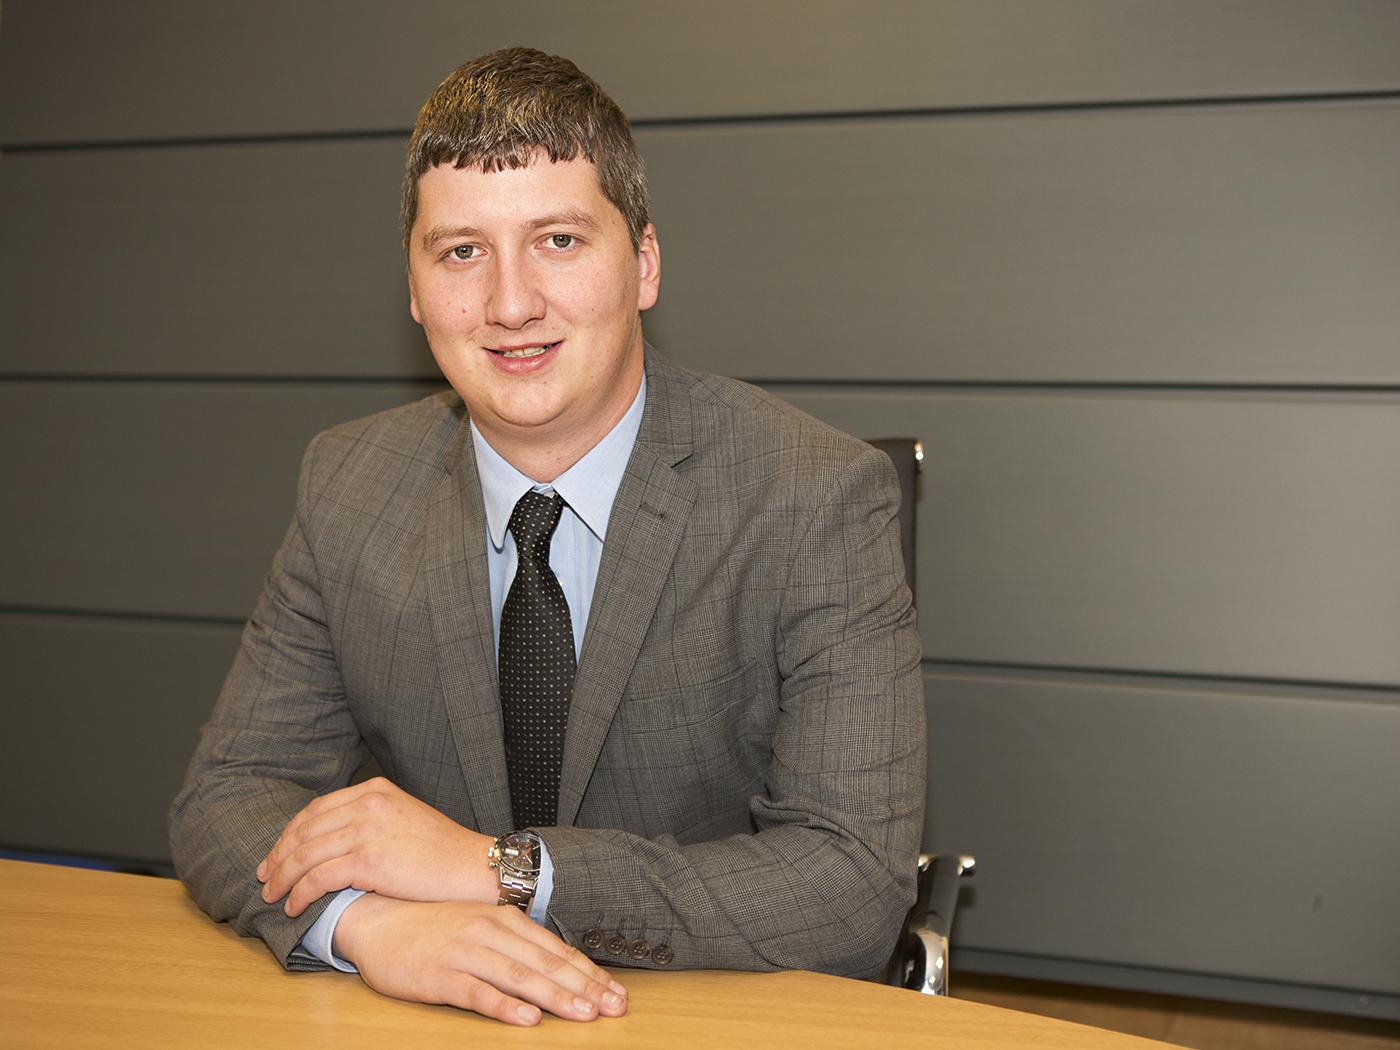 Aaron Hepworth - Flat Roofing Manager